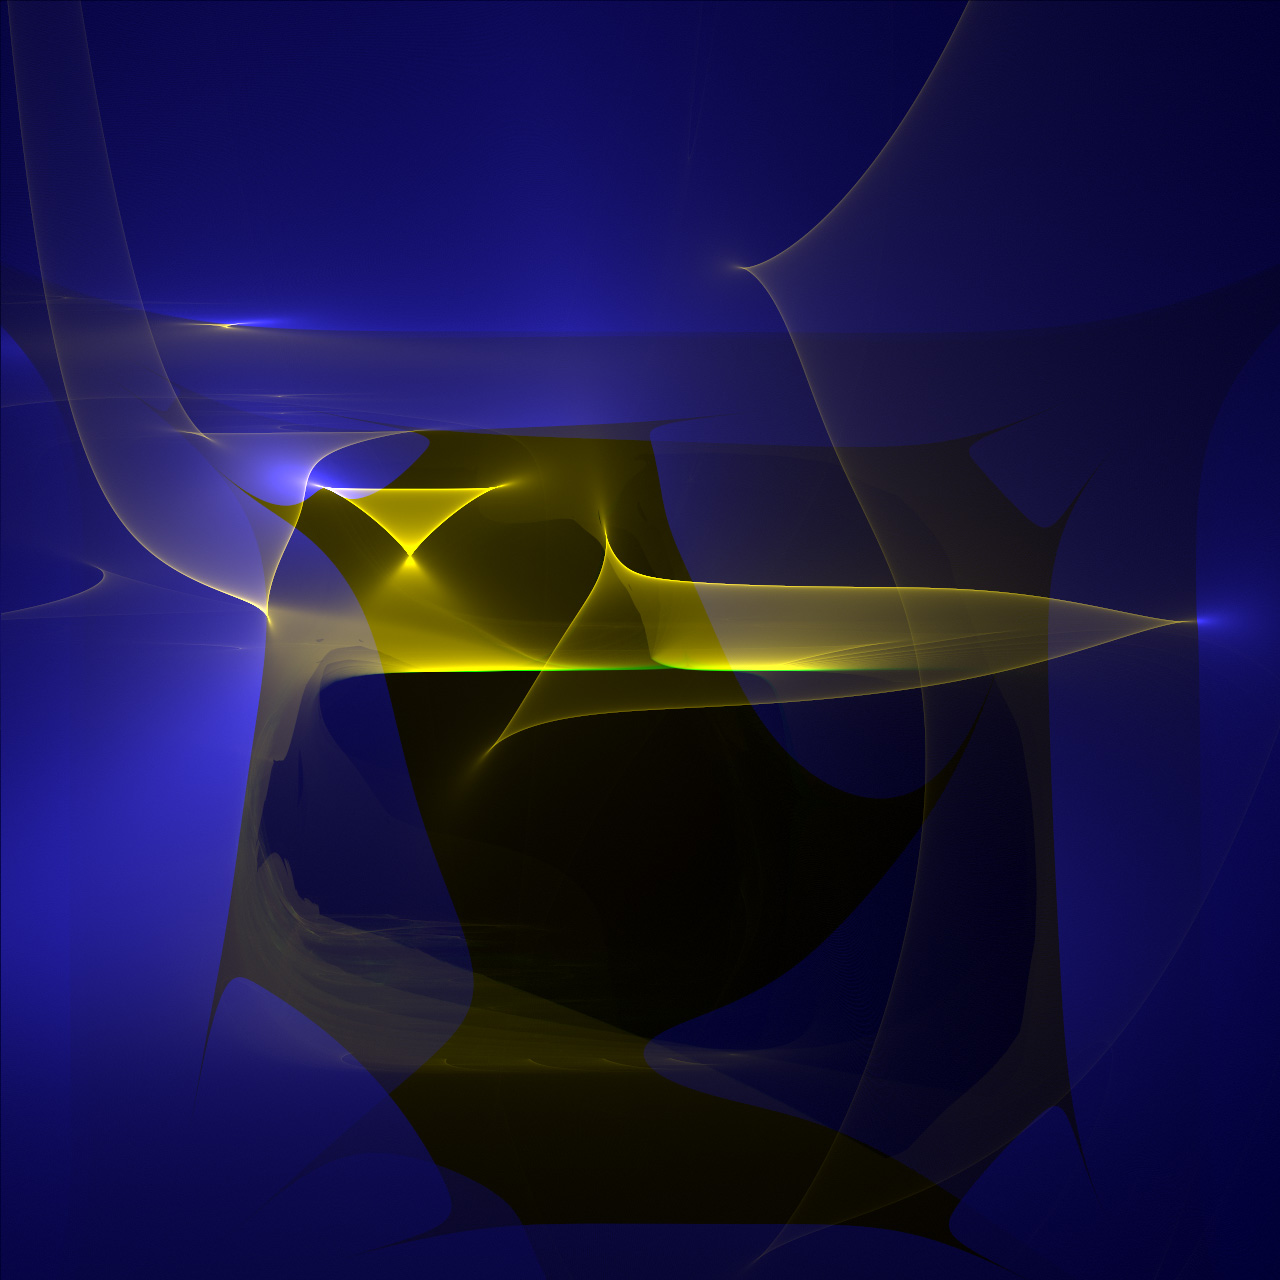 software_buddhabrot_image20